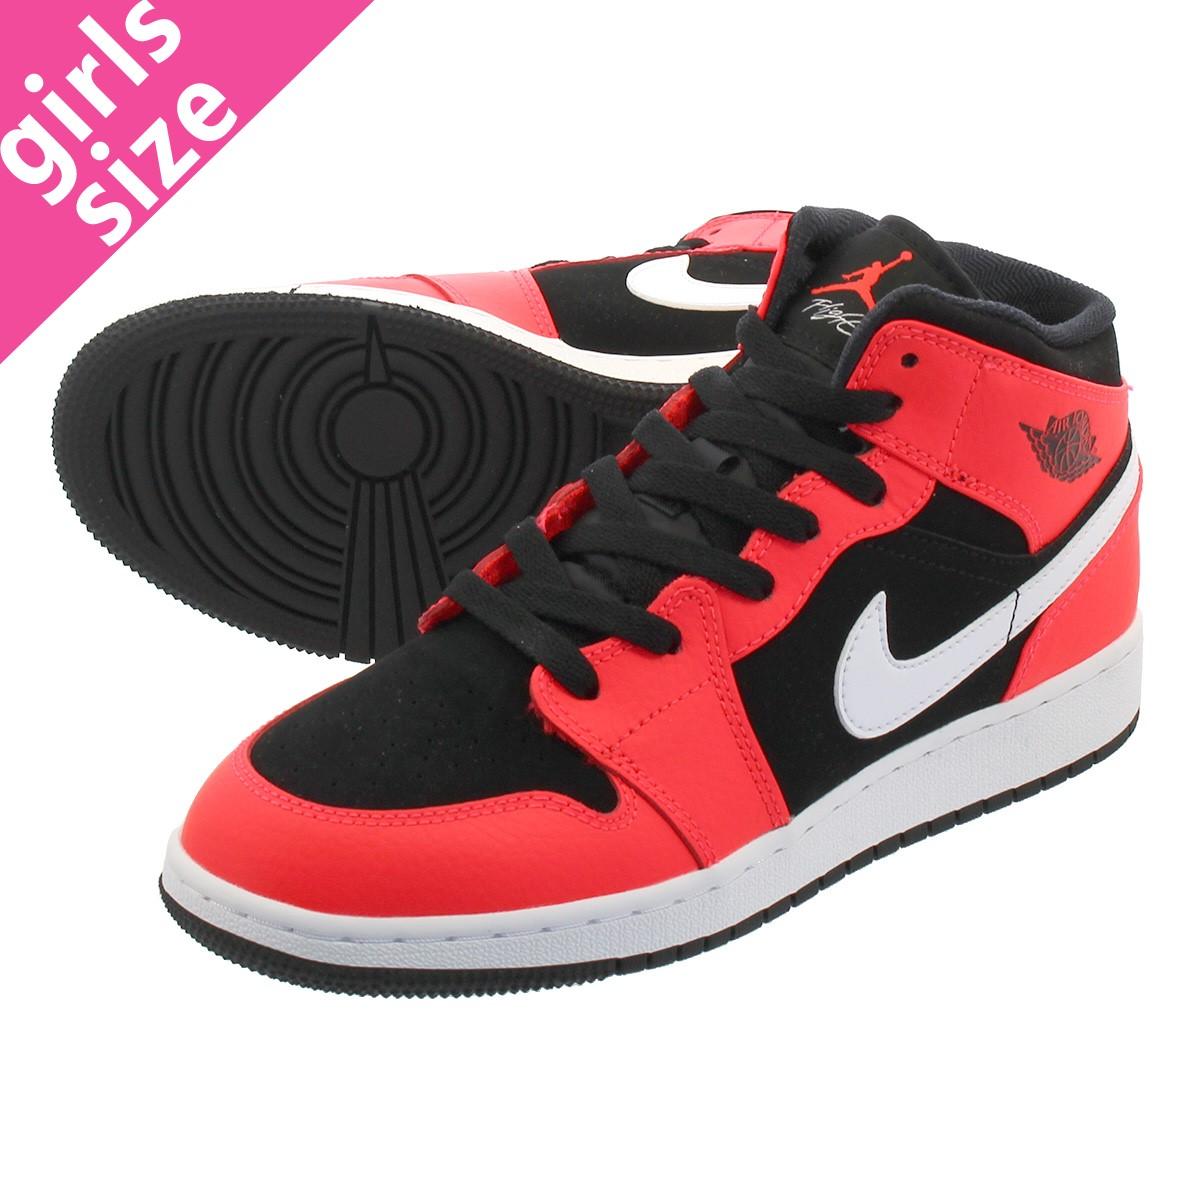 50c9cf220587e8 ... Jordan 1 Mid Infrared GS Sz 7